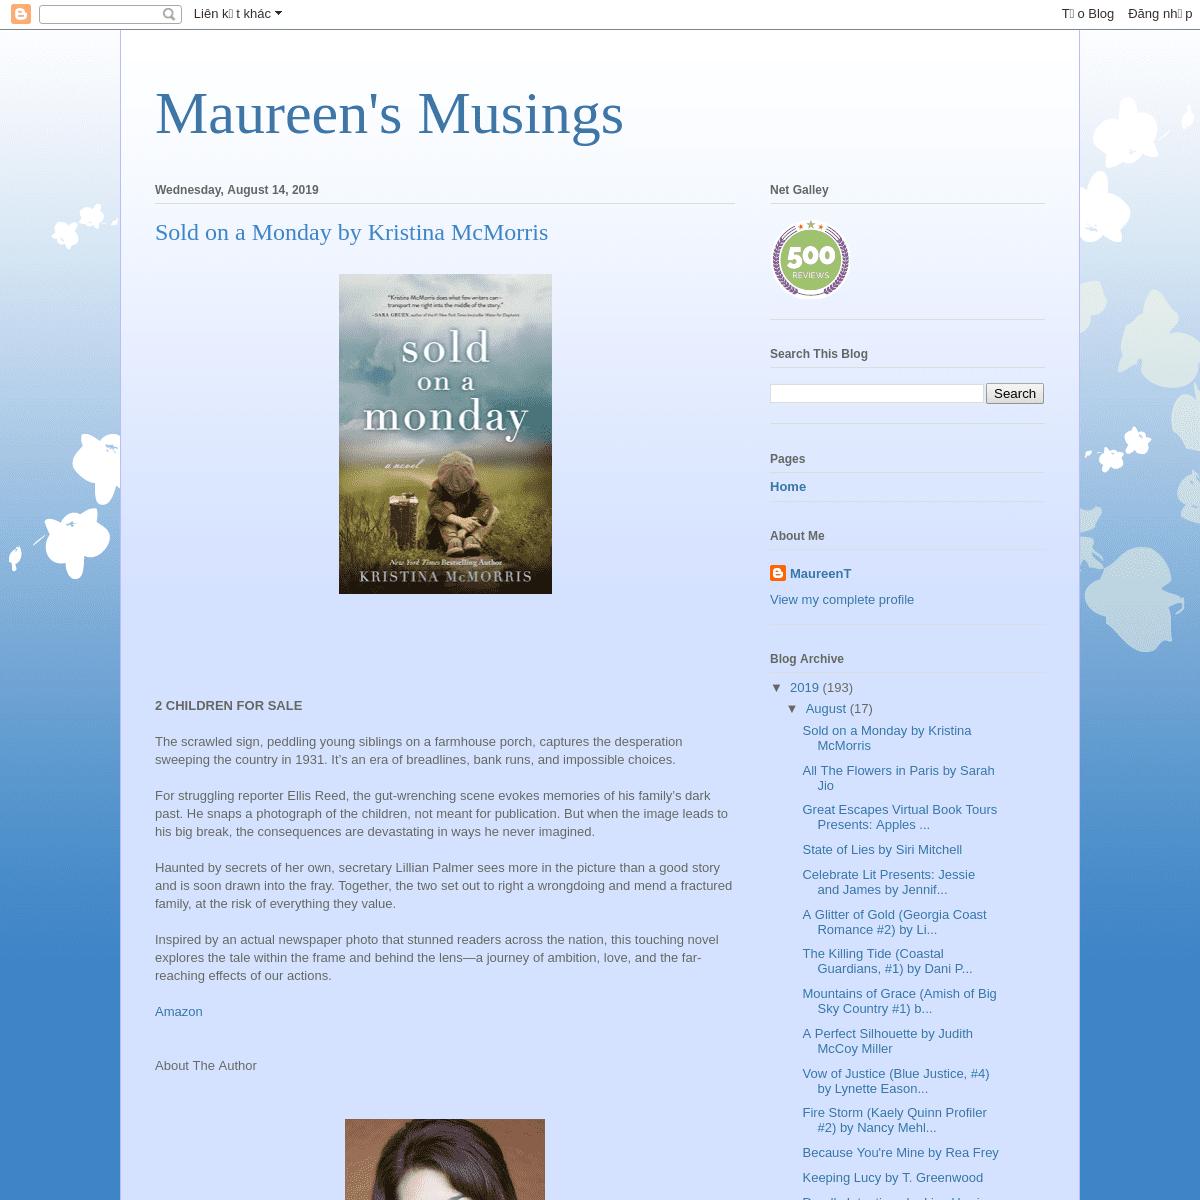 Maureen's Musings